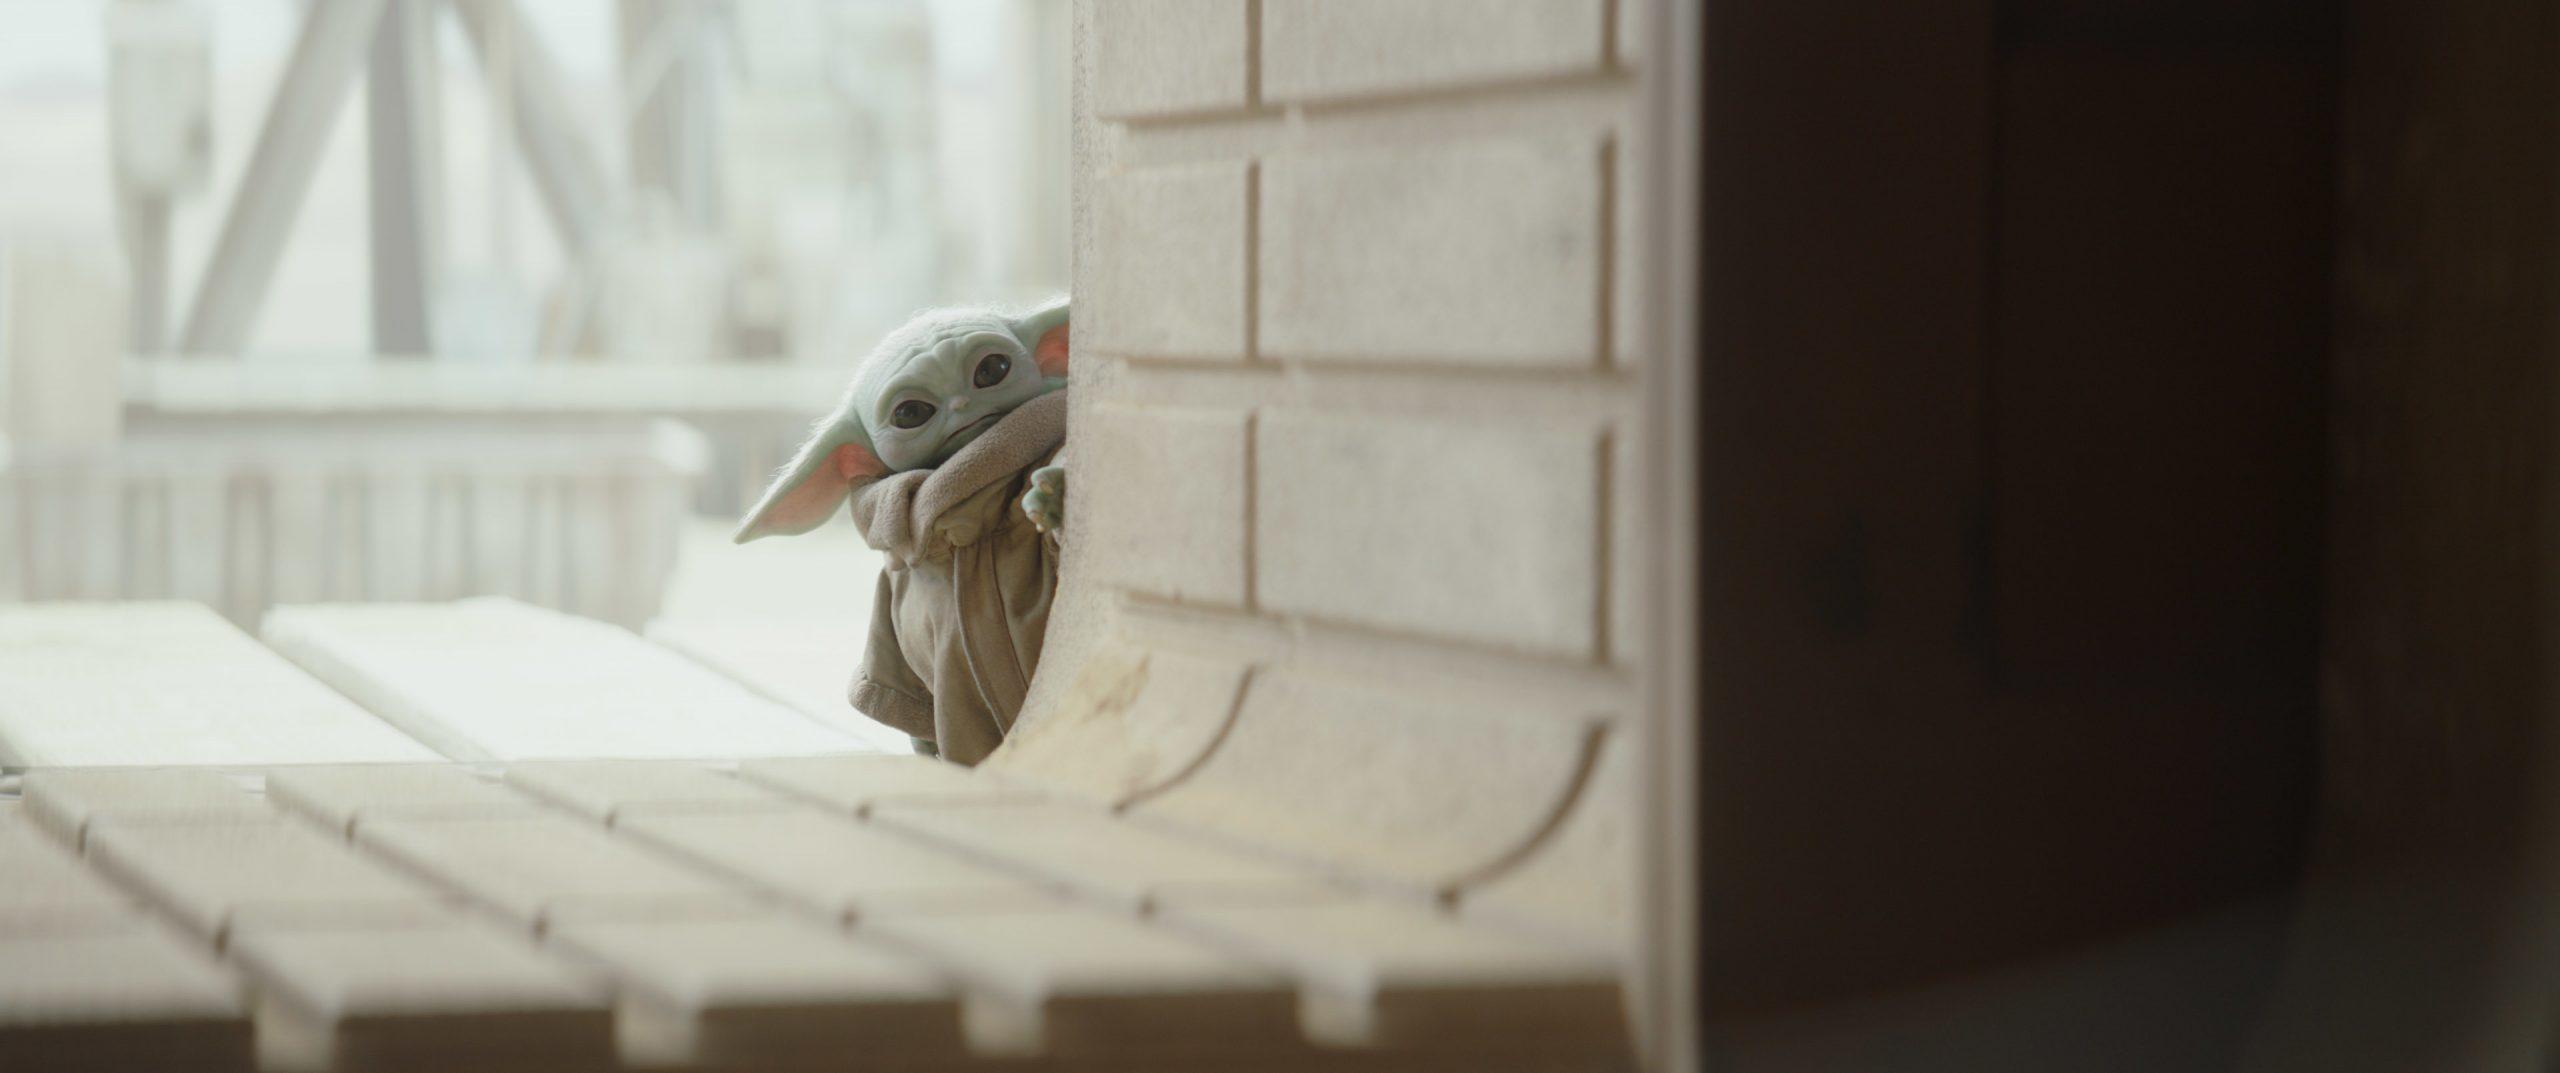 The Child, aka Baby Yoda, in Season 2 of 'The Mandalorian'